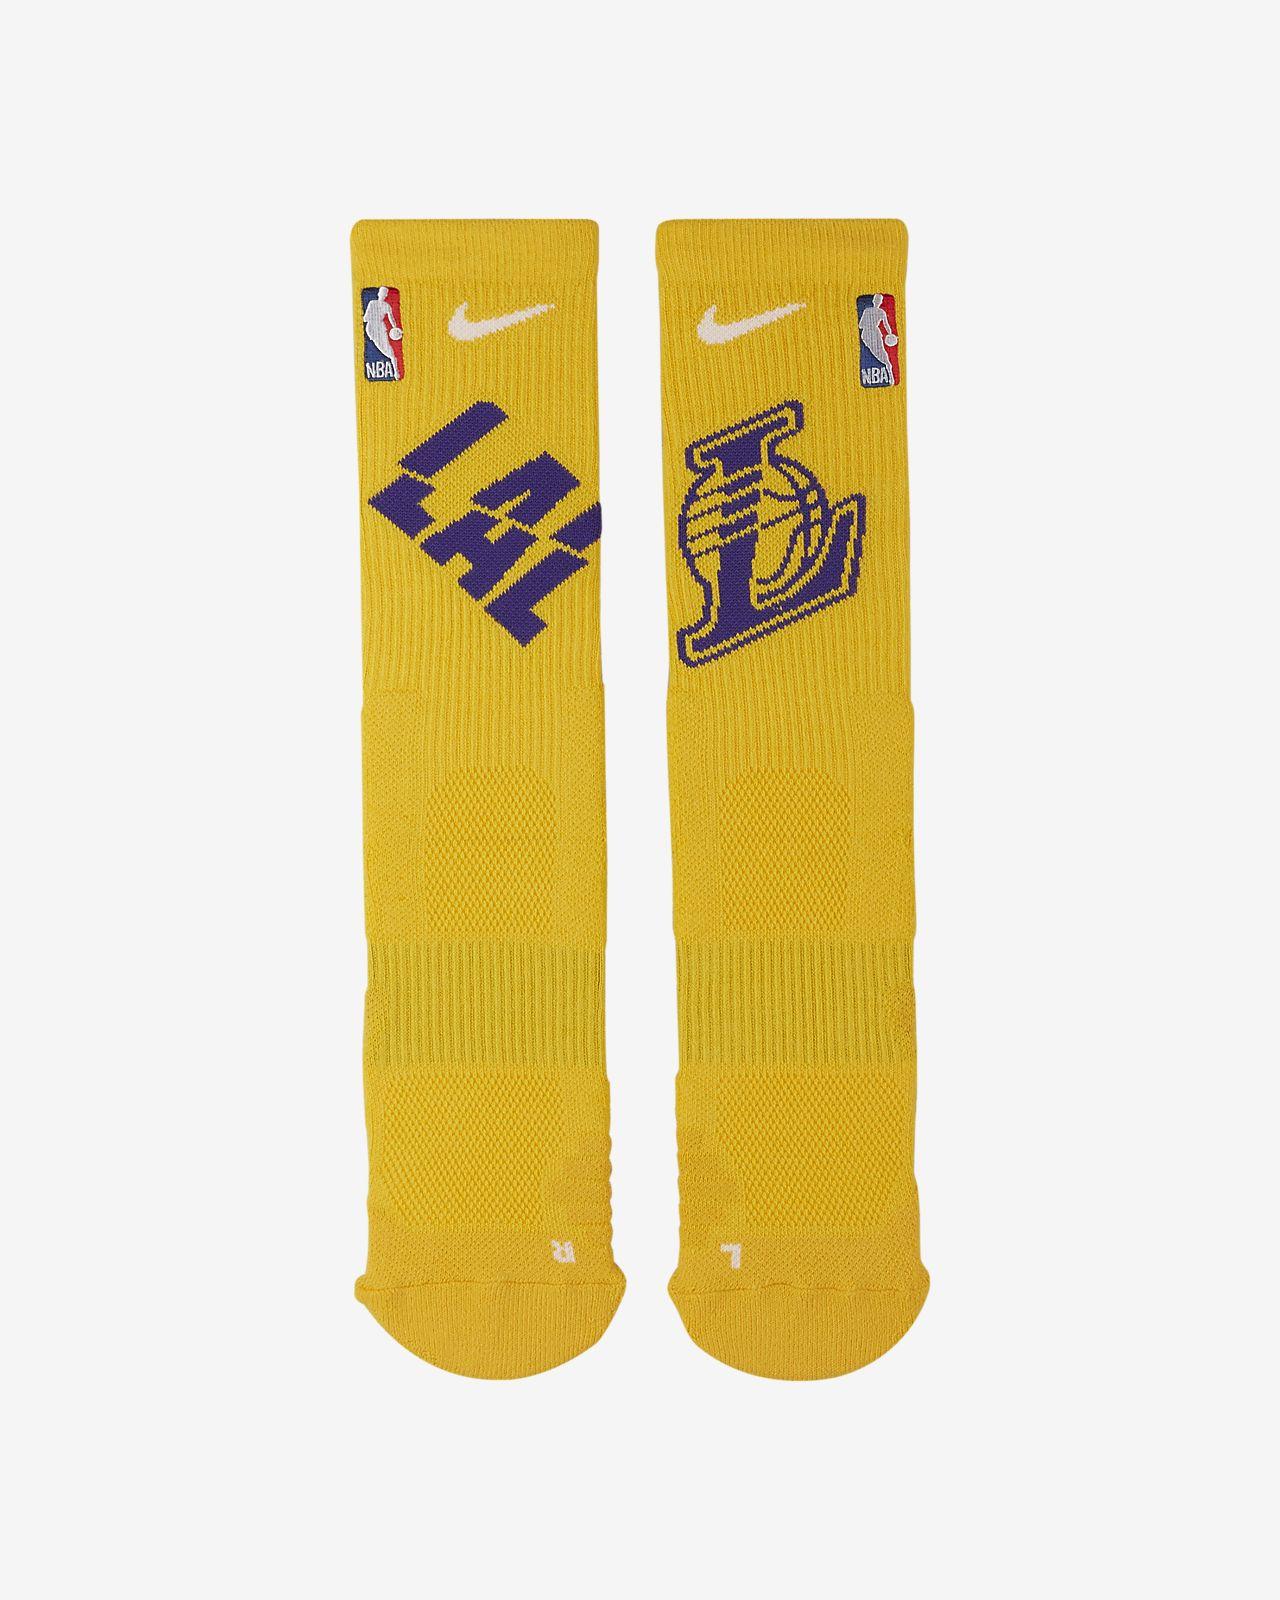 Los Angeles Lakers Nike Elite NBA 中筒襪